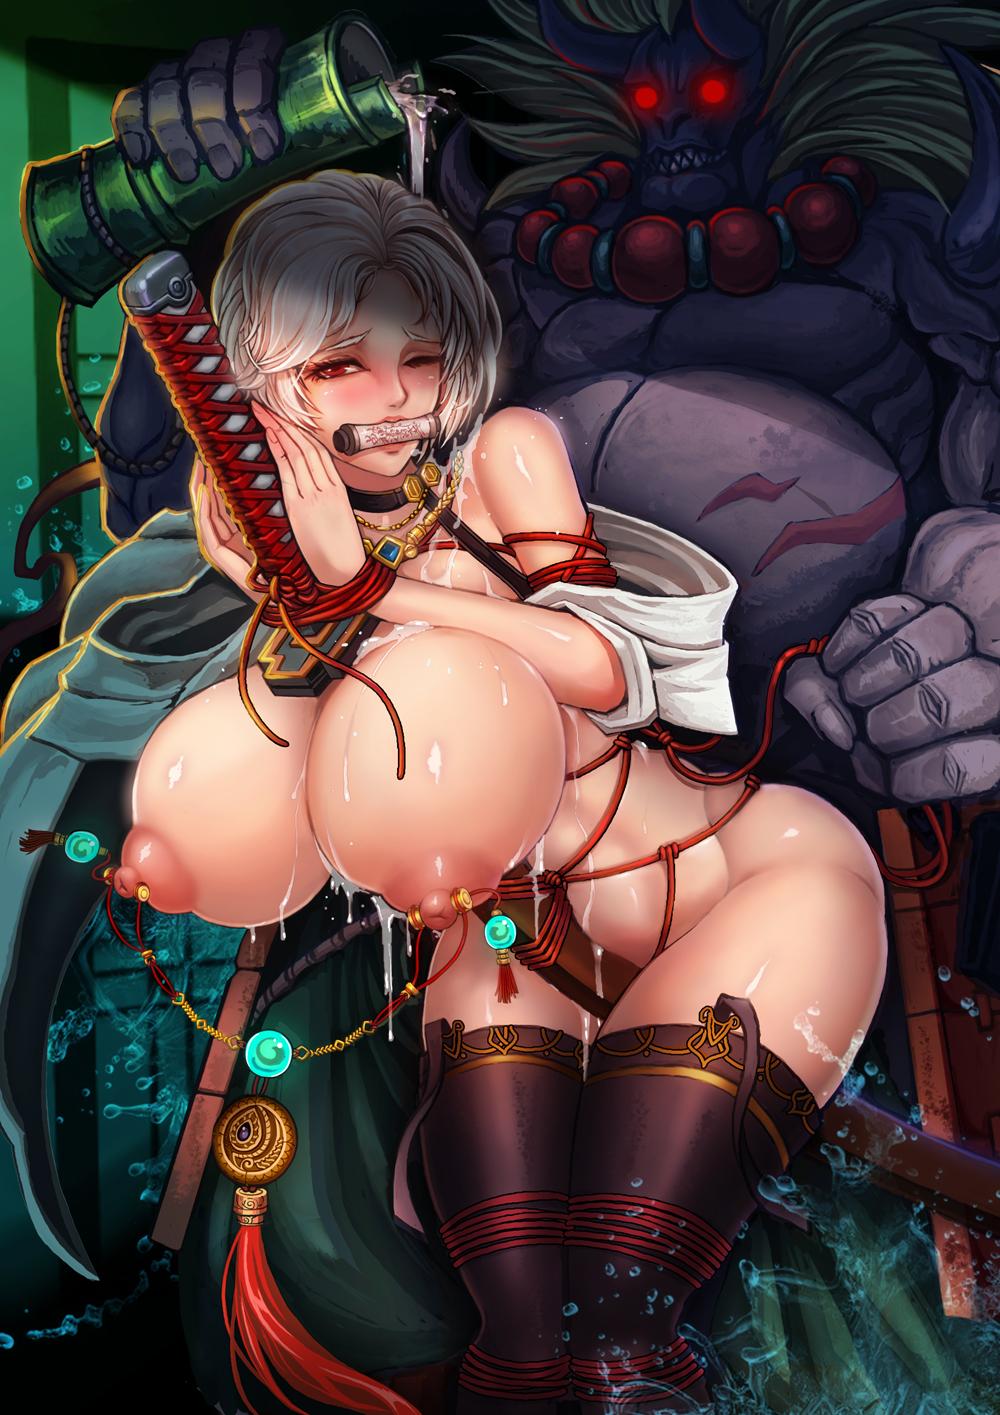 porn queen demon and mage Fight ippatsu juuden-chan